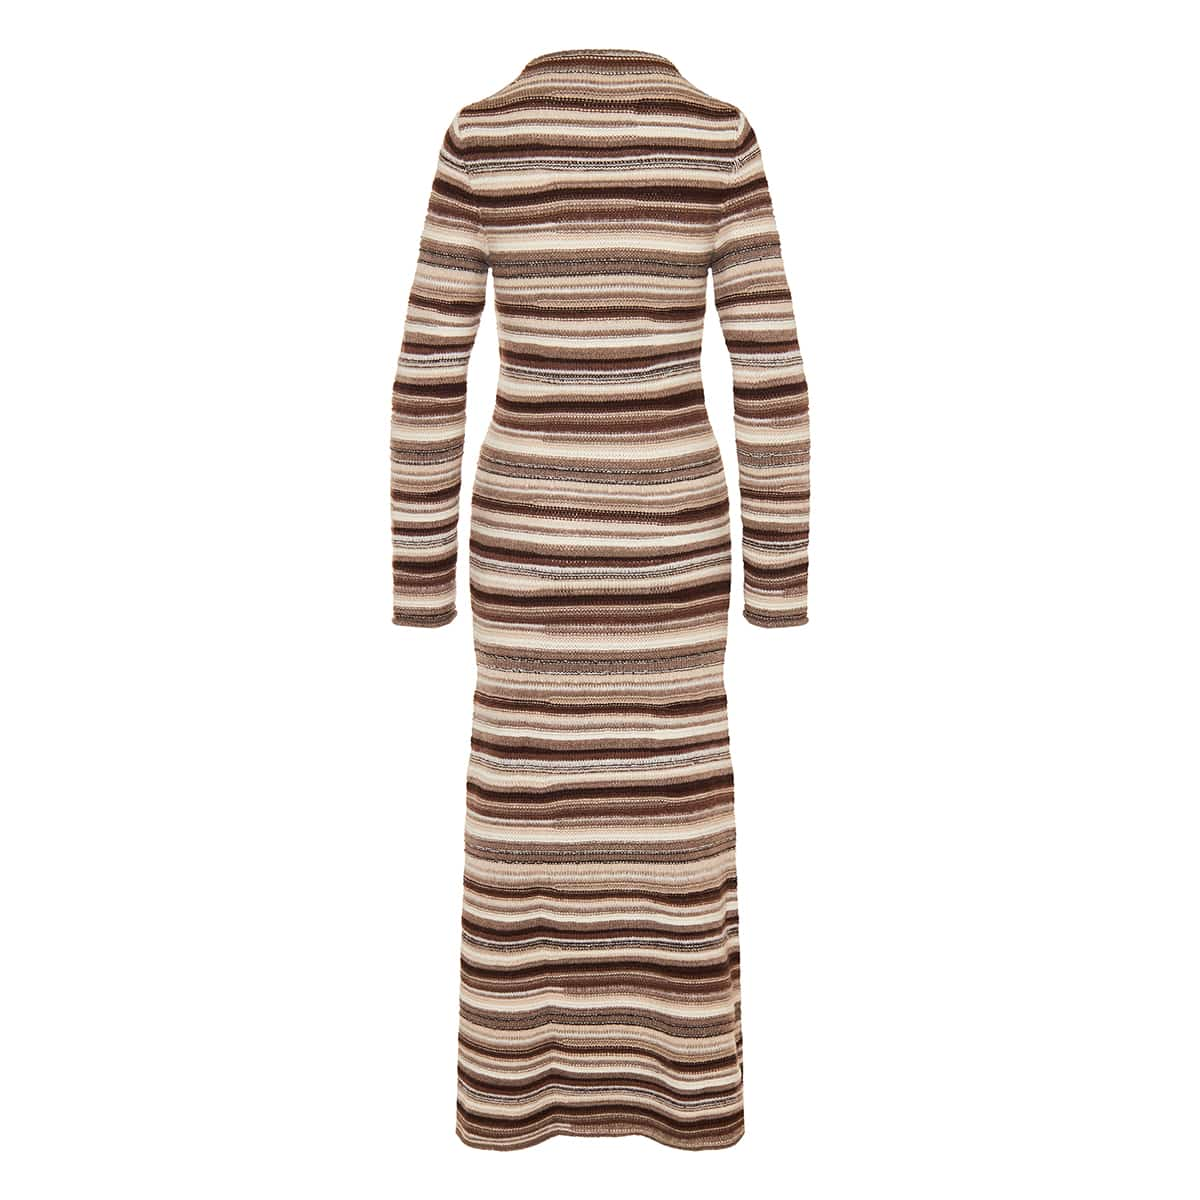 Striped long cashmere-knit dress